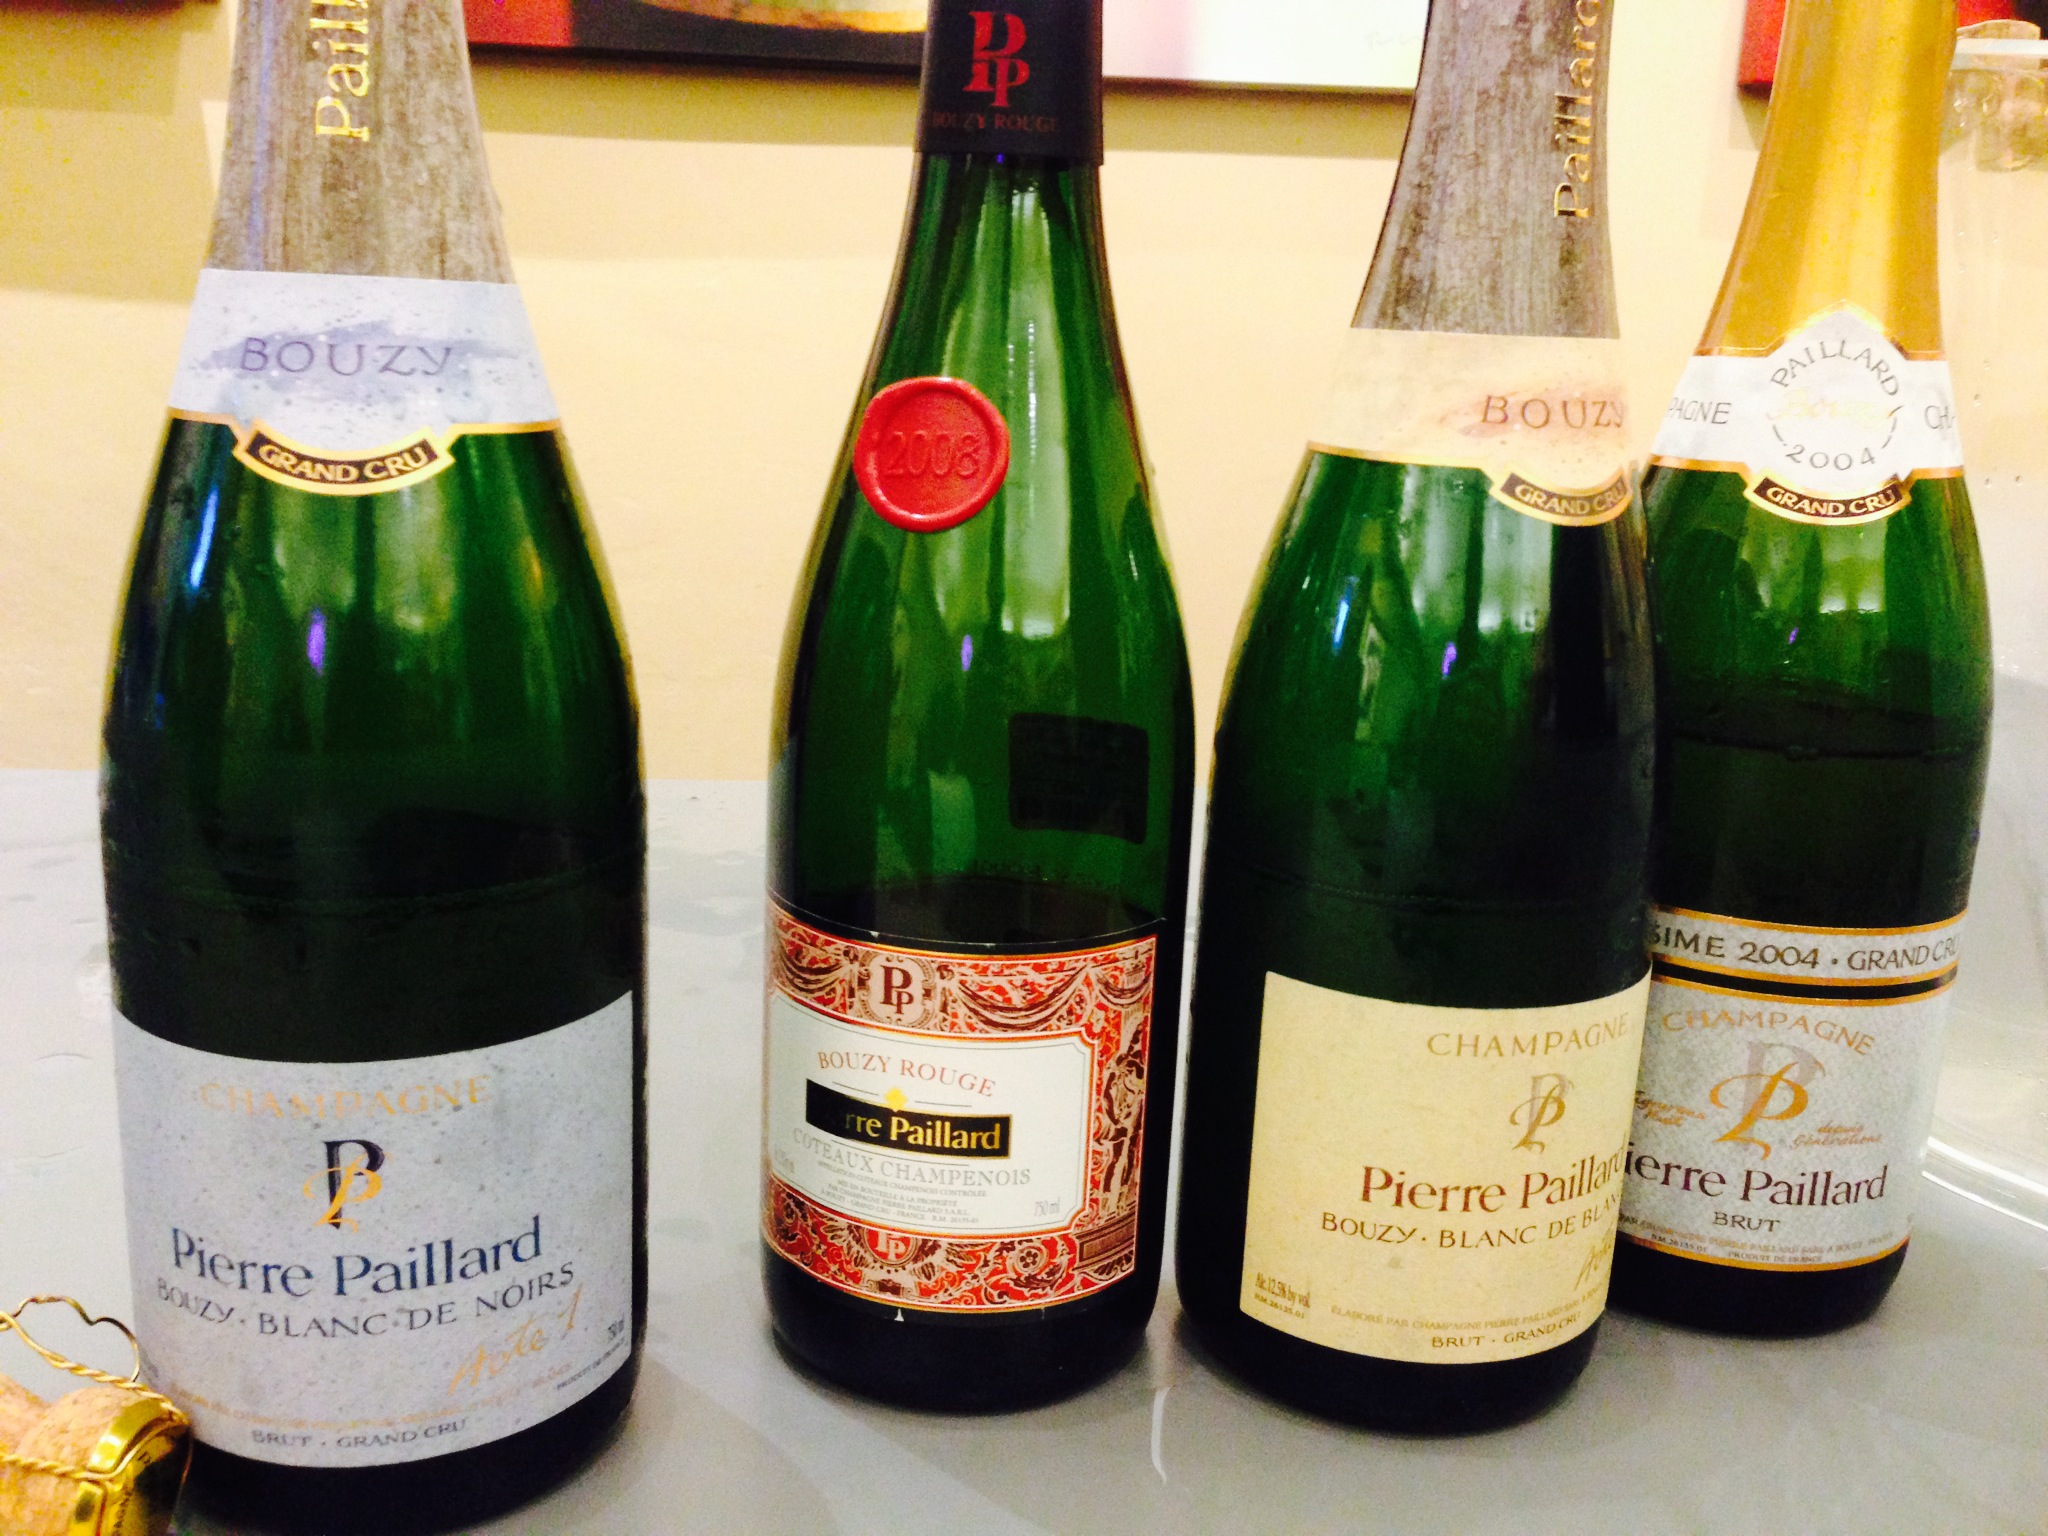 champagne pierre paillard